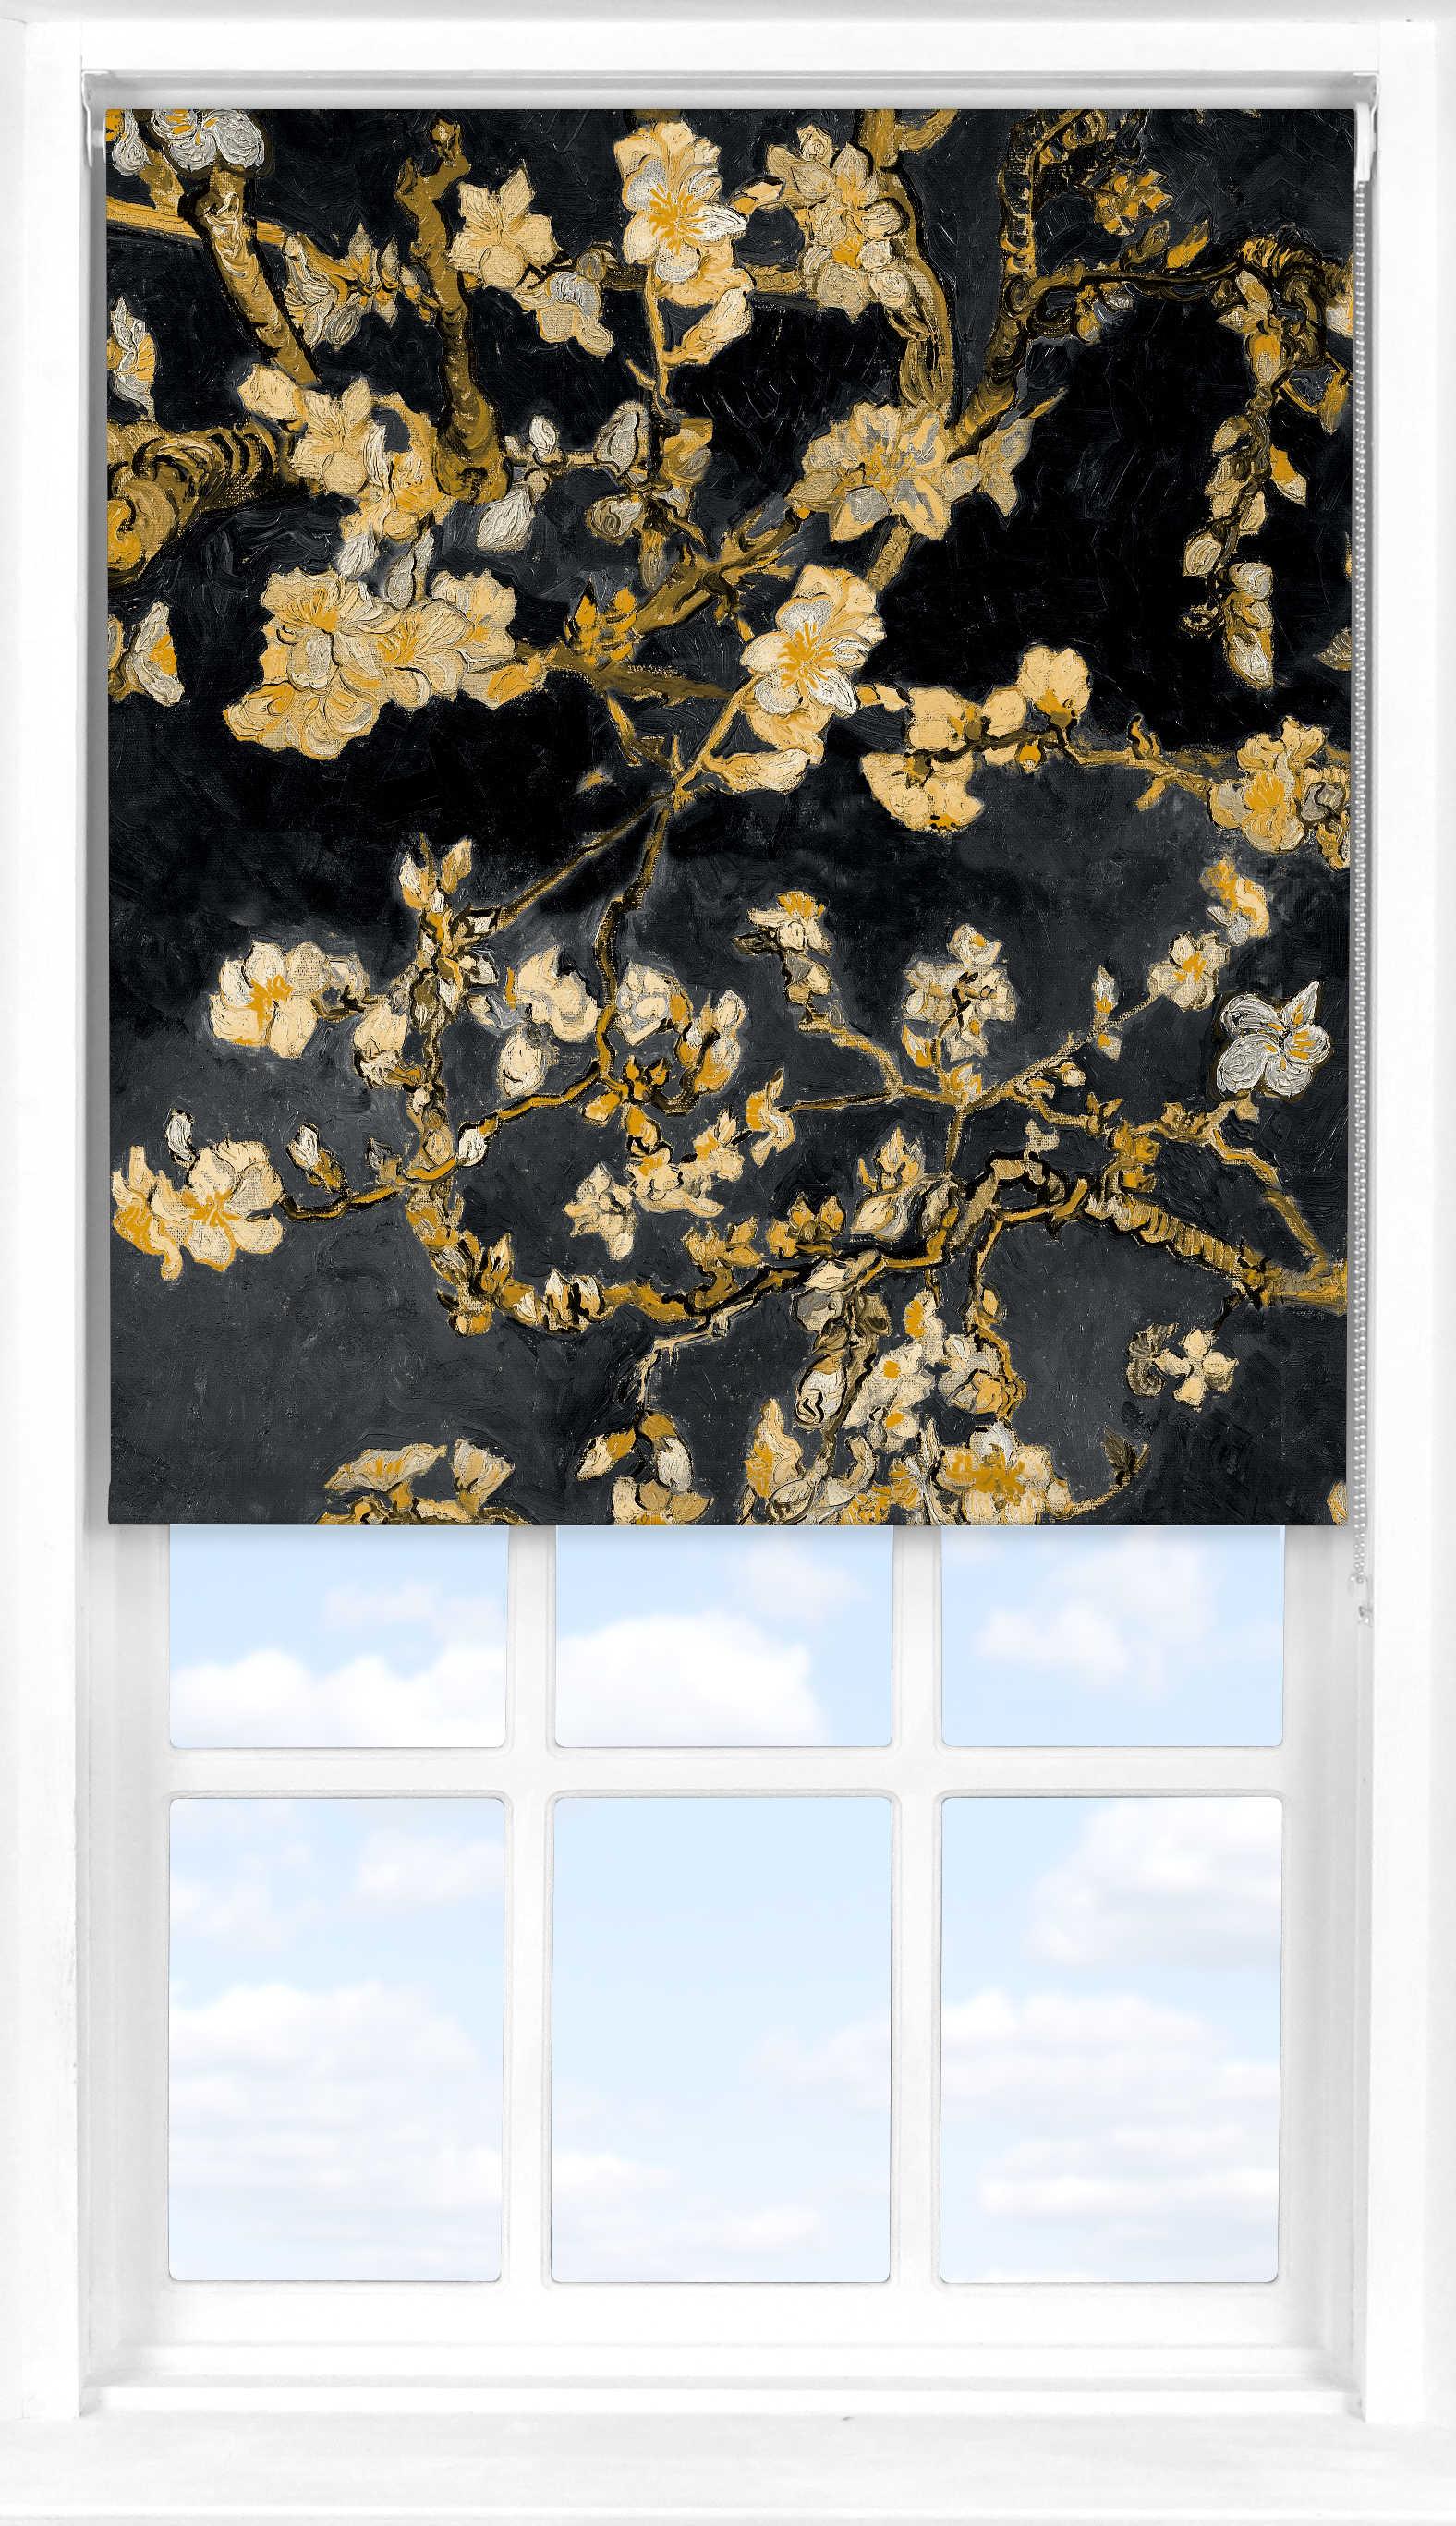 Roller Blind in Van Gogh Almond Blossom Black Translucent